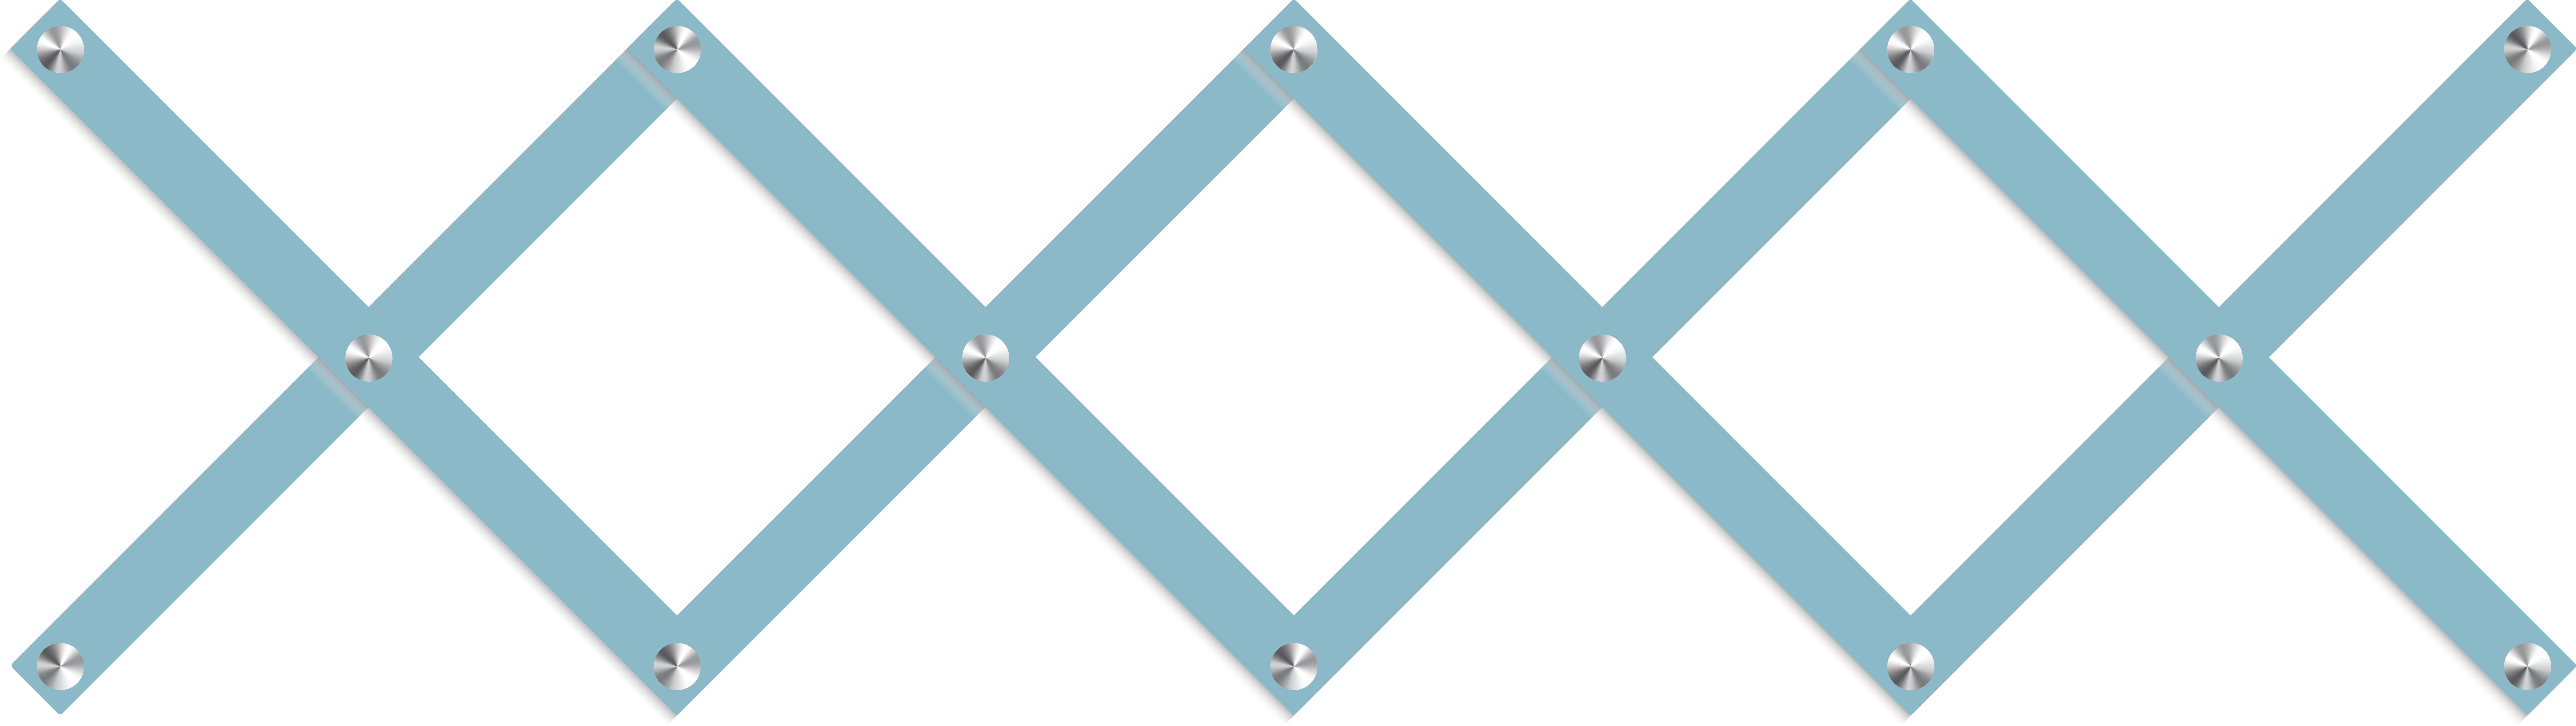 queence Garderobenleiste »Julius«, 14 Haken & 8 Garderobenleisten